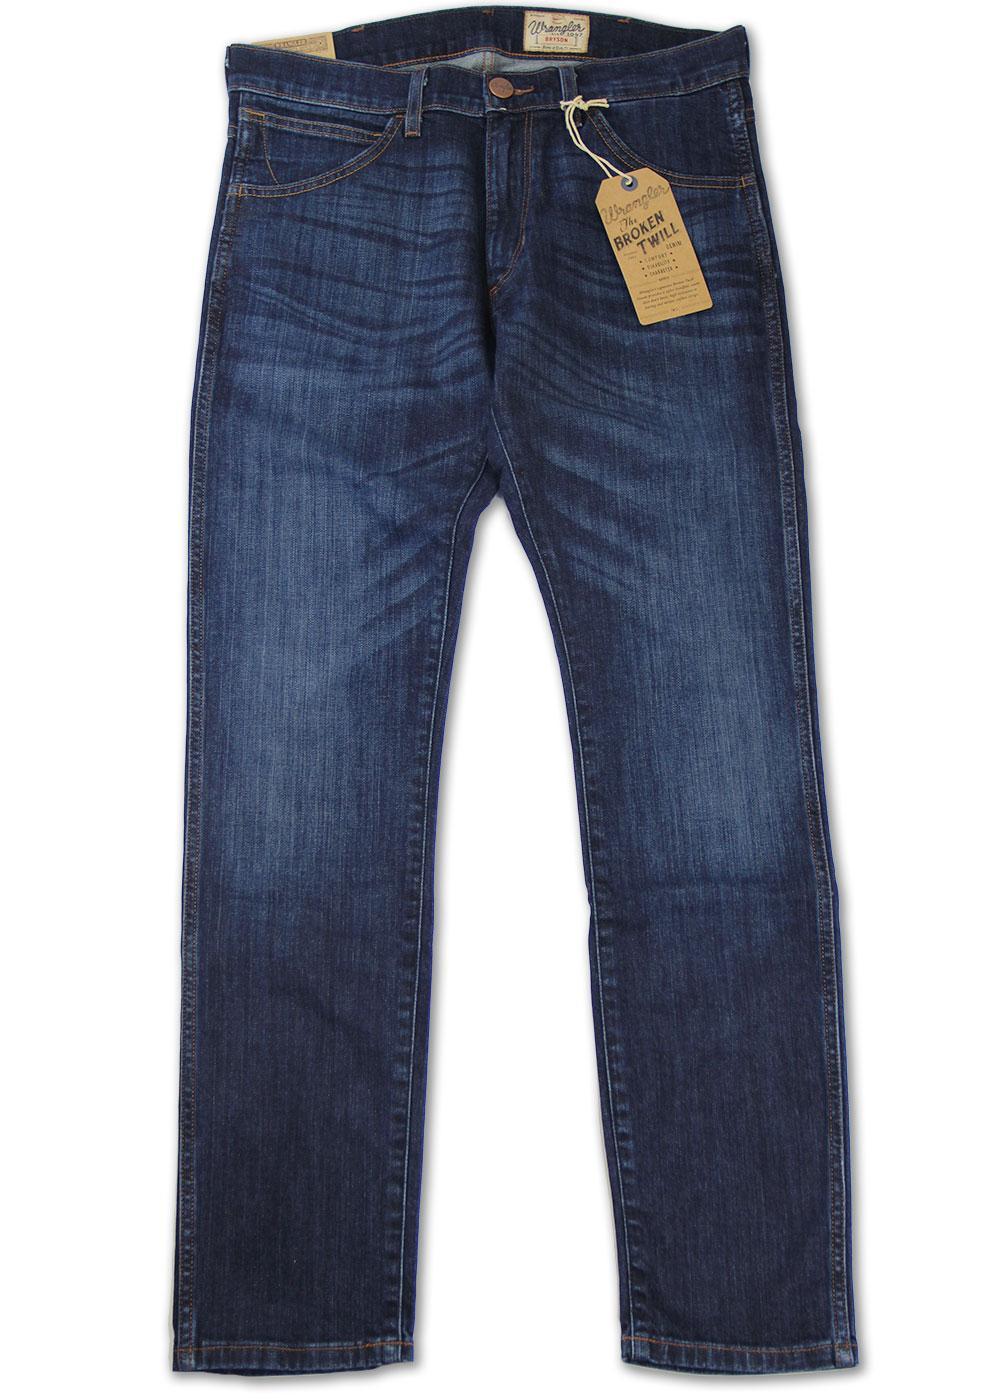 Bryson WRANGLER Day Sailing Blue Skinny Cut Jeans